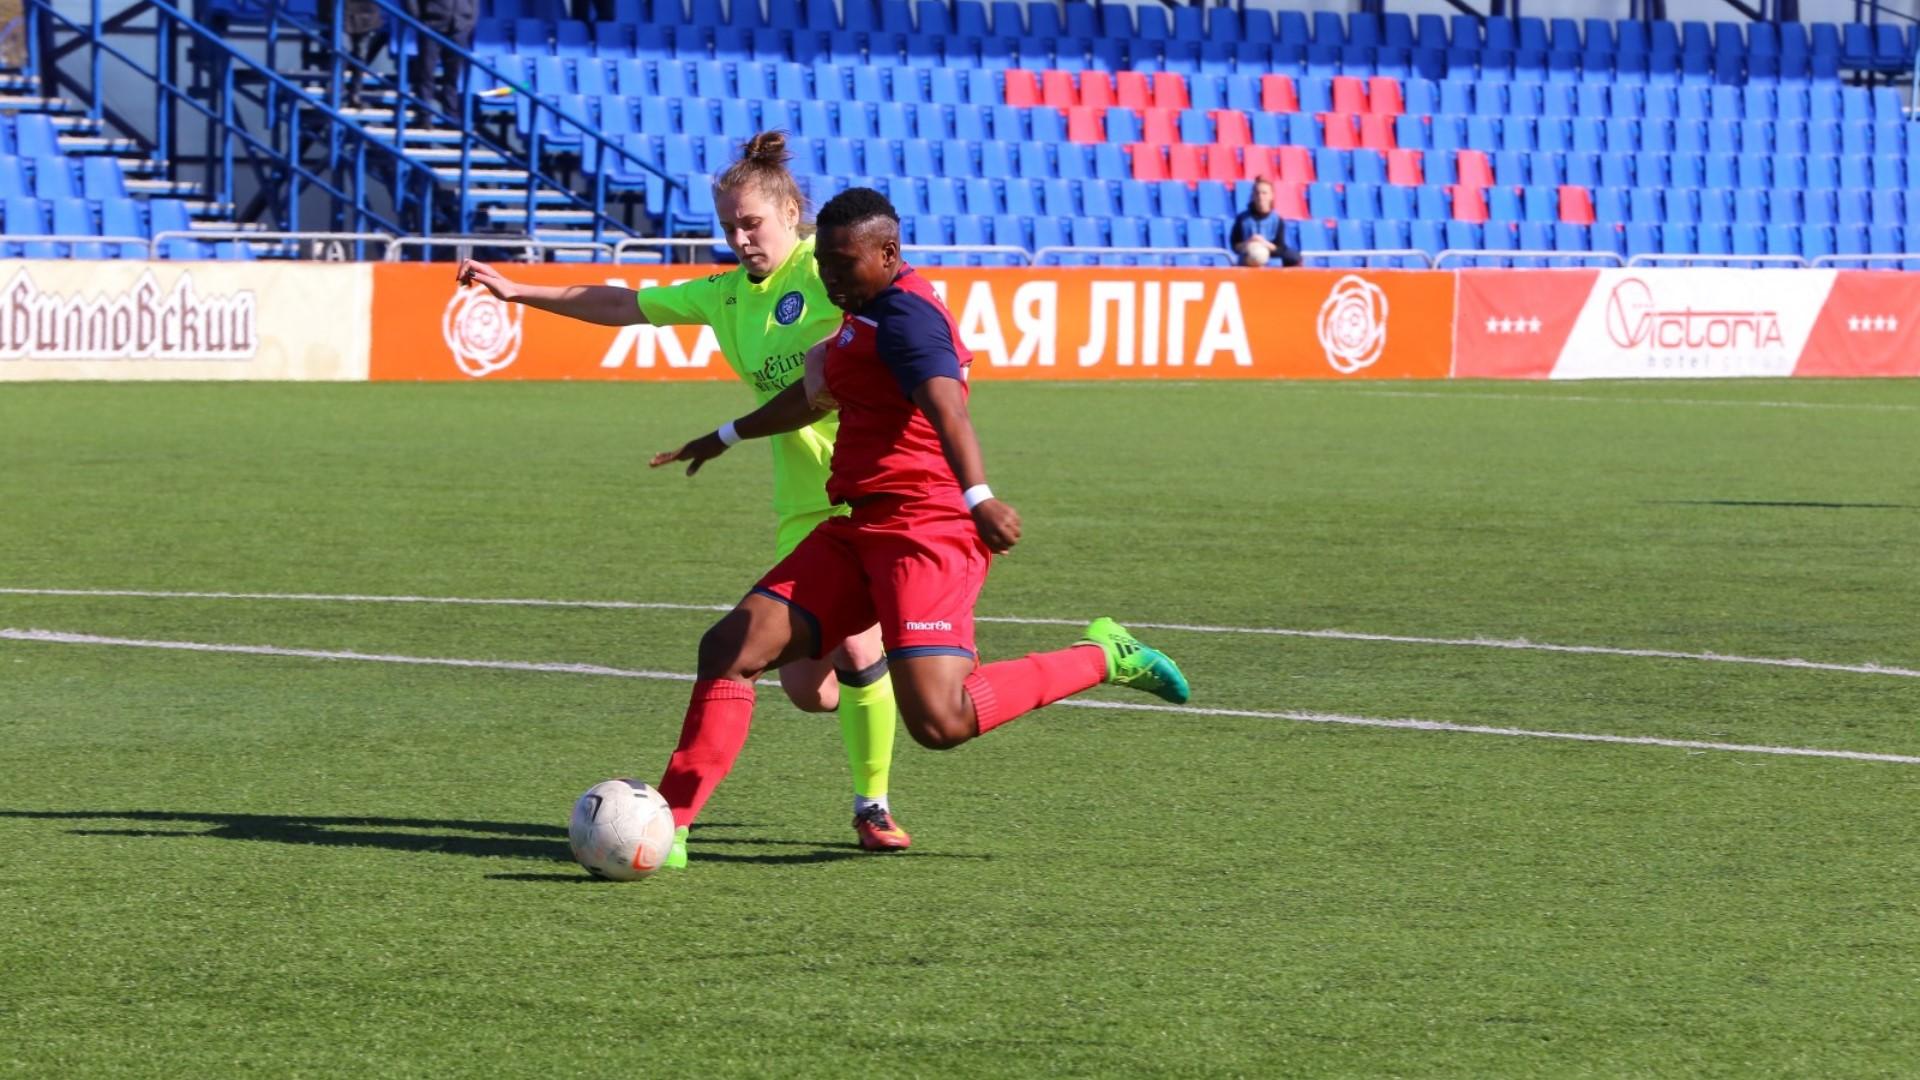 Niyolle, Wogu scores & Ogbiabekhva nets hat-trick as Minsk thrash Dnepr Mogilev